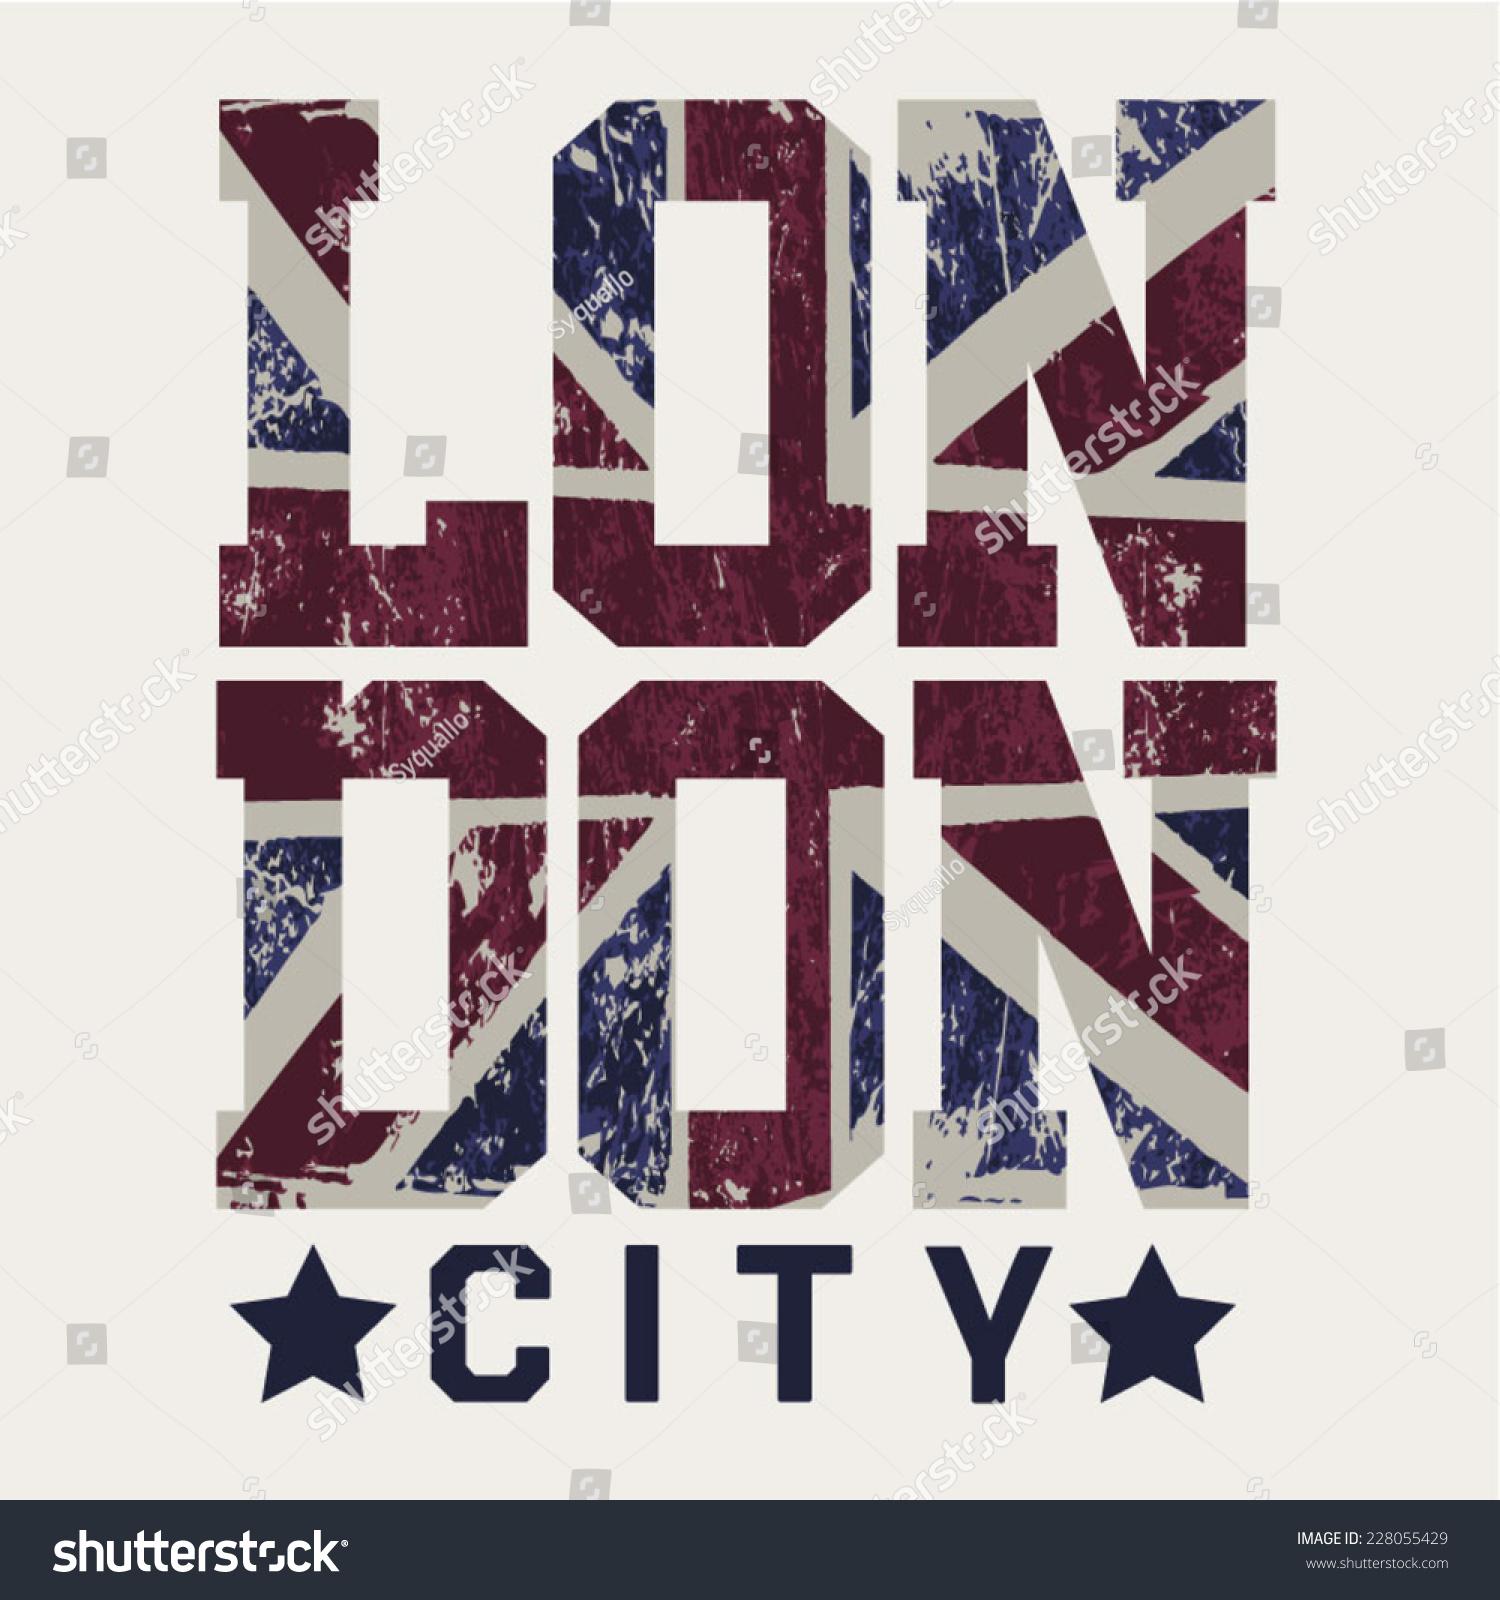 Shirt design london - Vintage London City Typography T Shirt Graphics Vectors